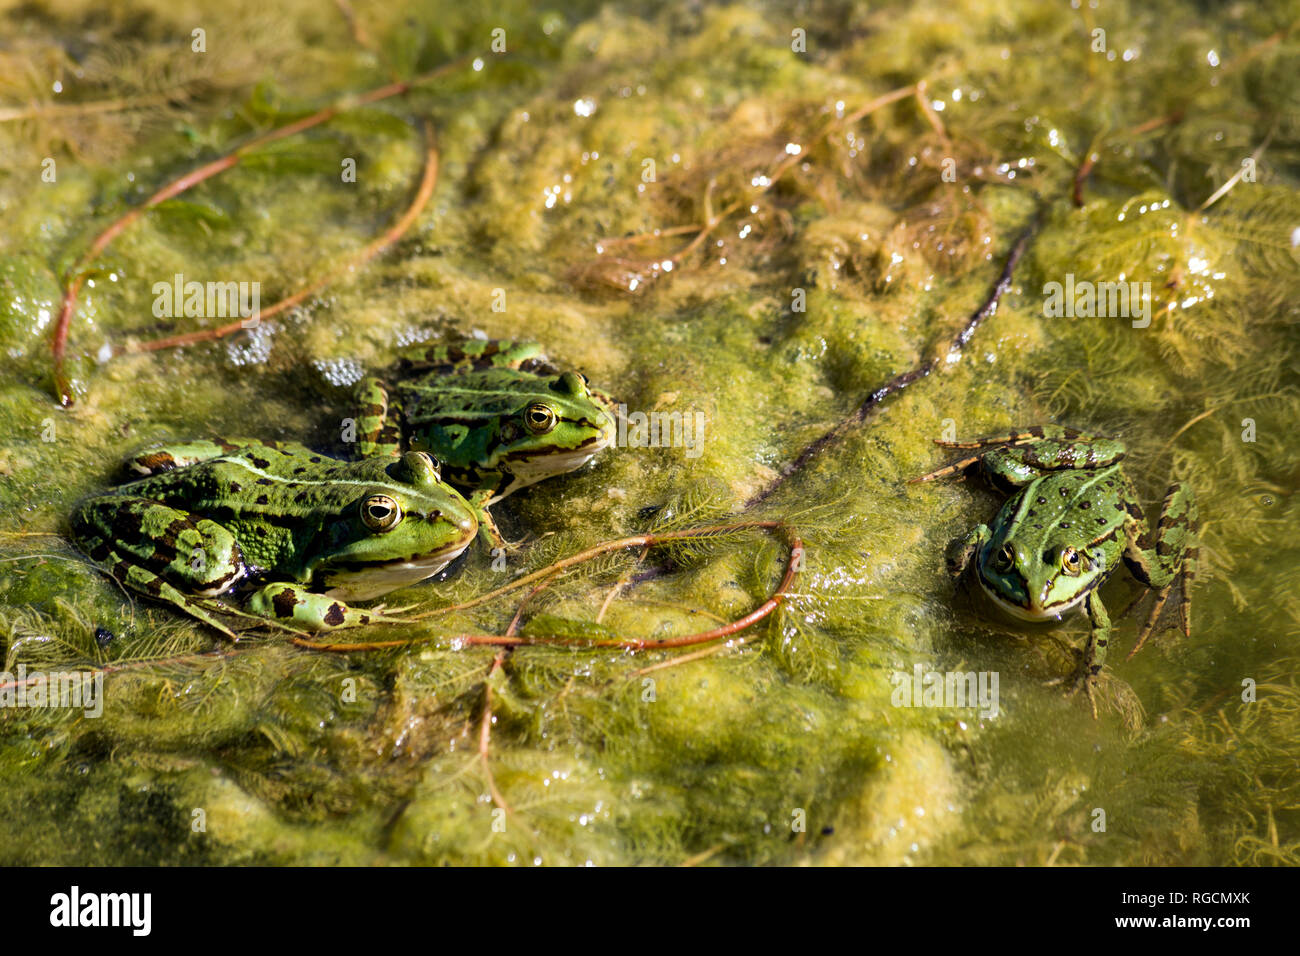 Pool frogs, Rana esculenta - Stock Image